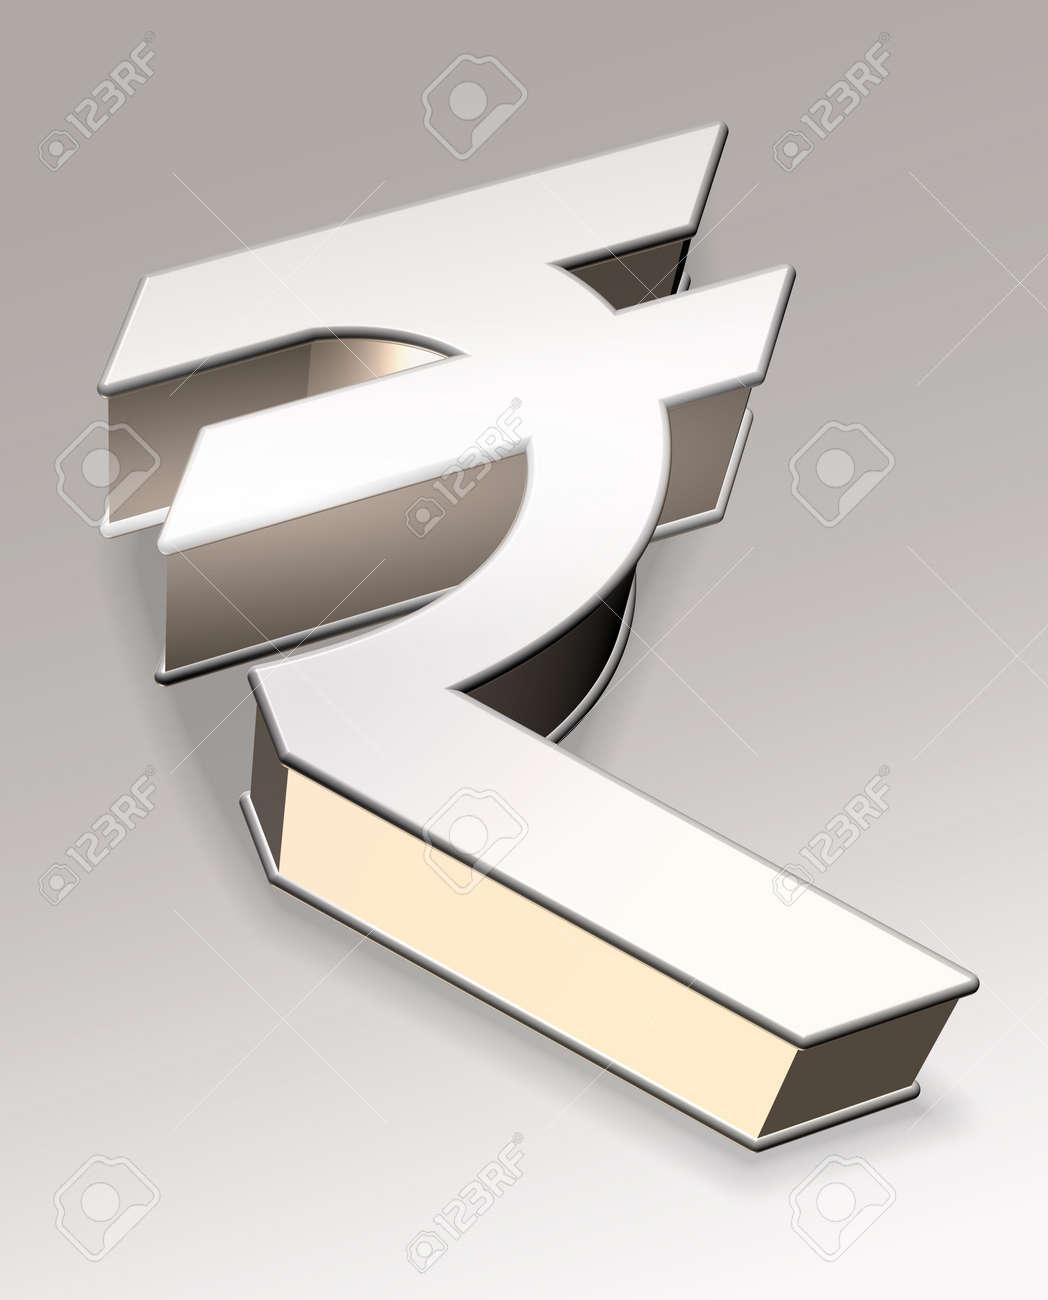 3d illustration of indian rupee symbol stock photo picture and 3d illustration of indian rupee symbol stock illustration 12034914 biocorpaavc Choice Image